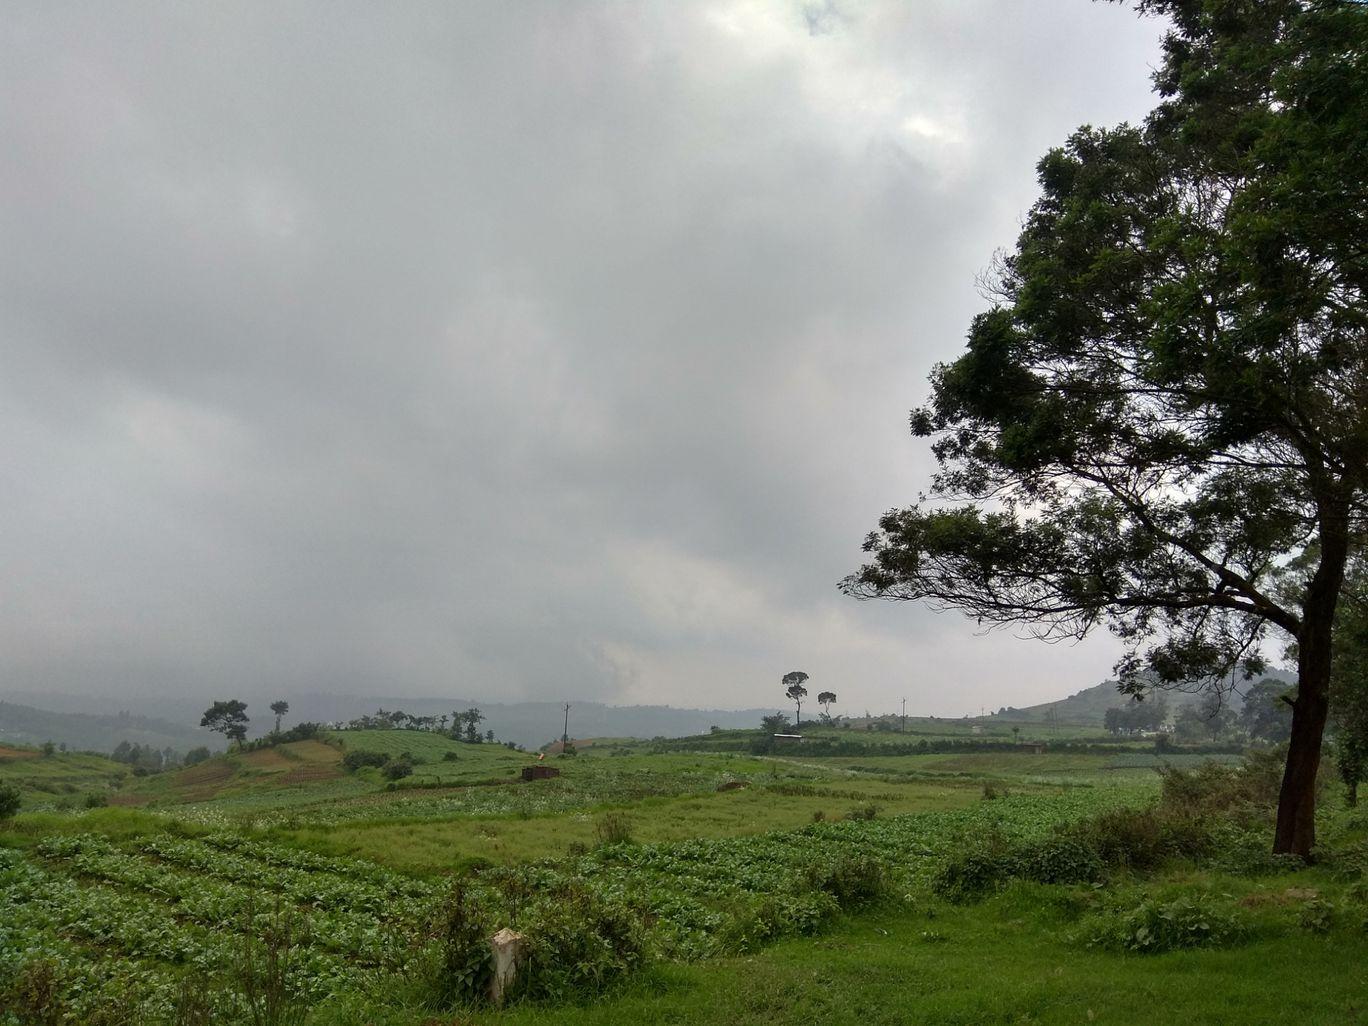 Photo of Shillong By Anurag shrivastava